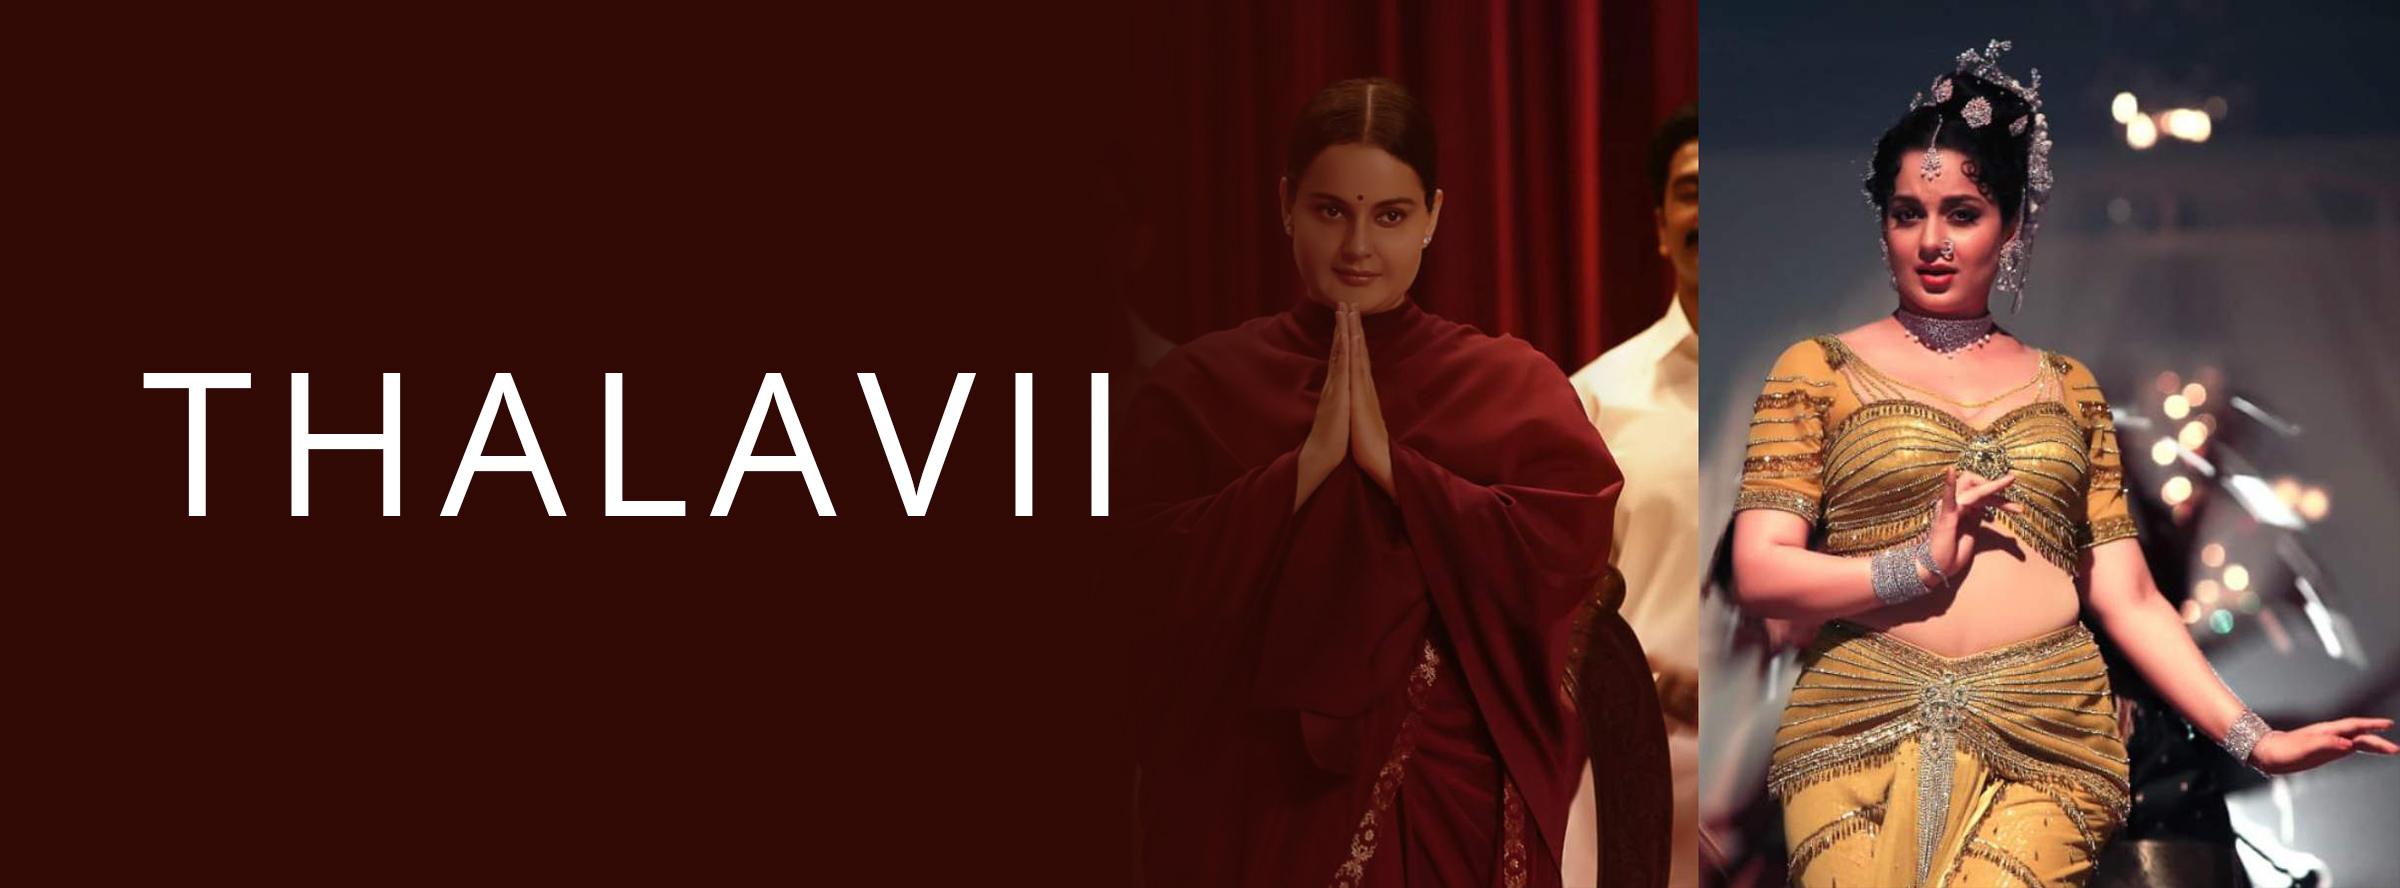 Slider Image for Thalaivii (Hindi)